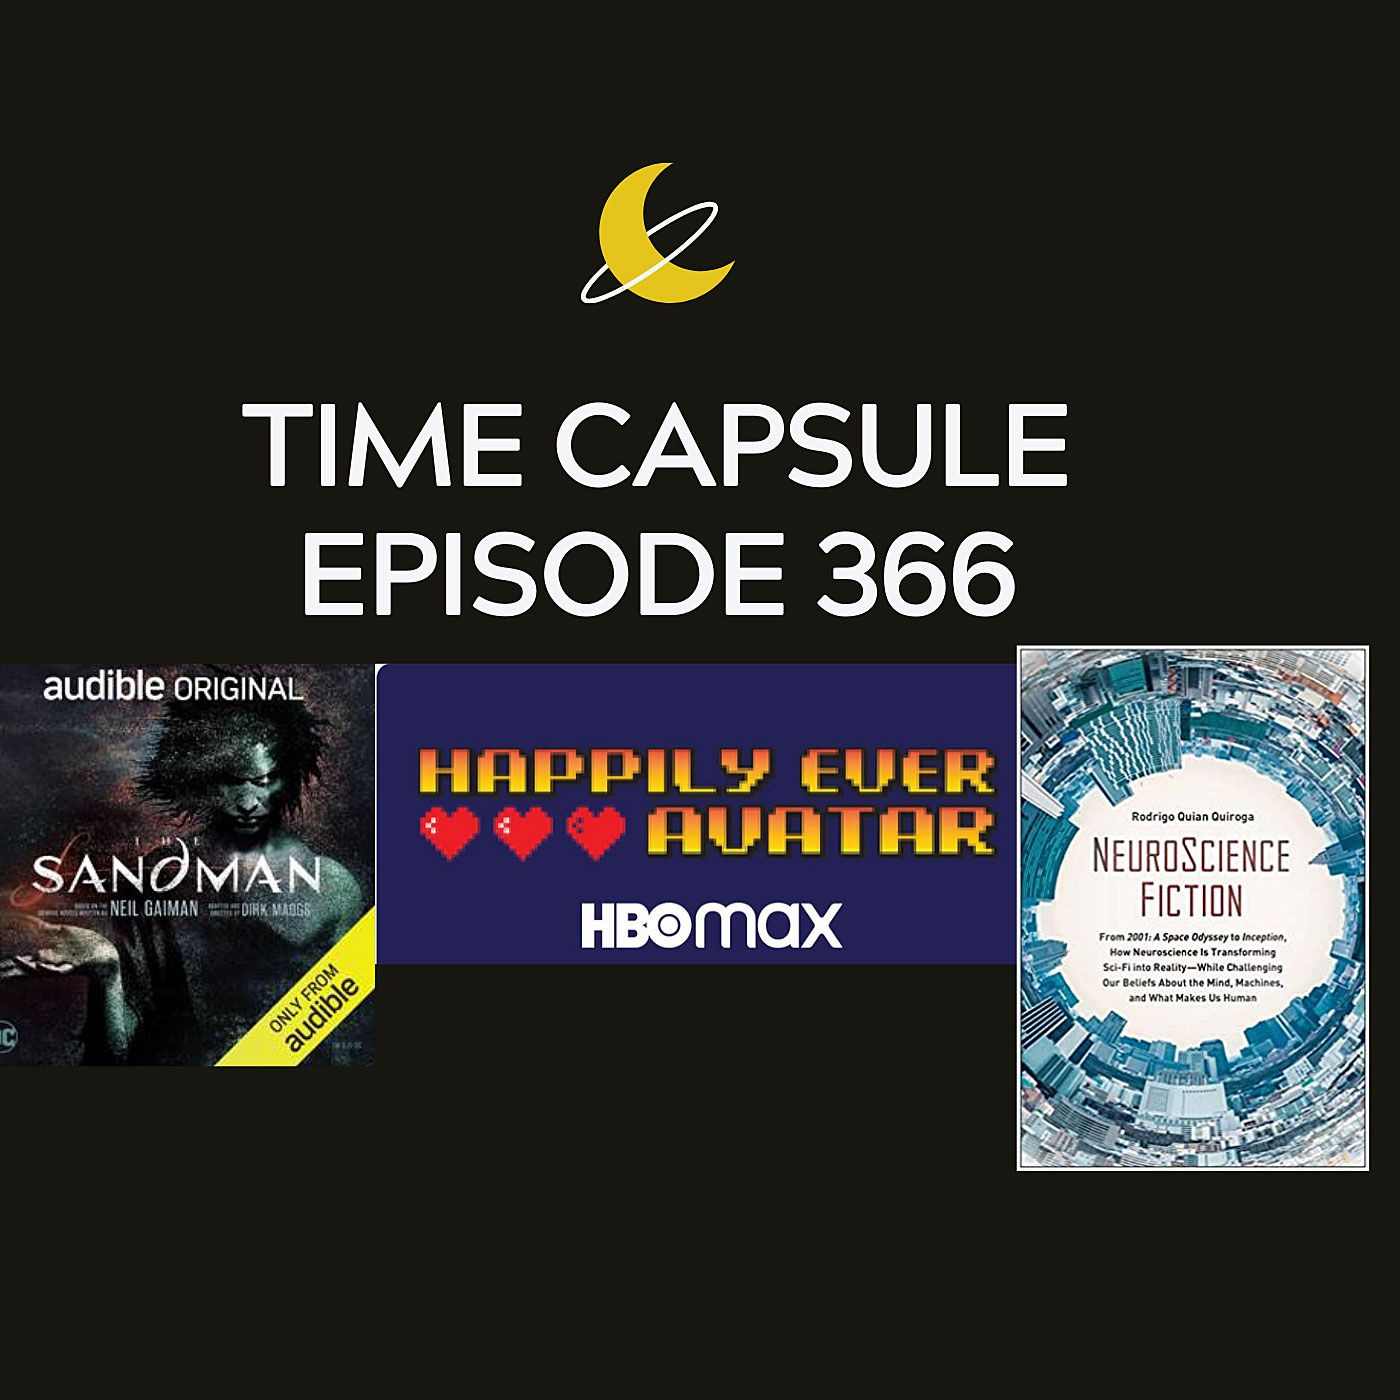 Time Capsule Episode 366